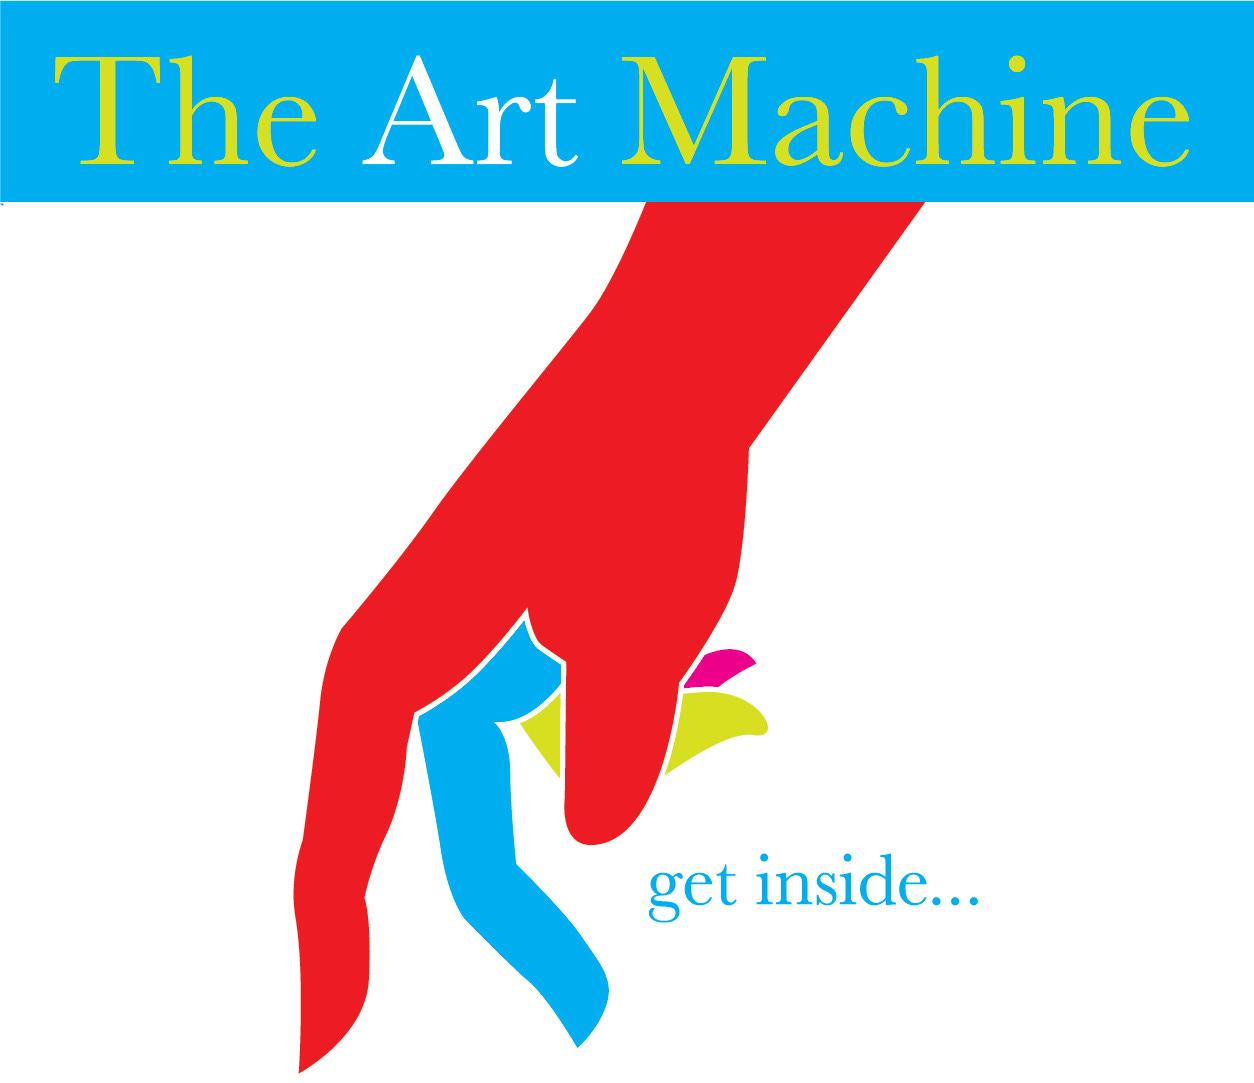 The Art Machine: get inside